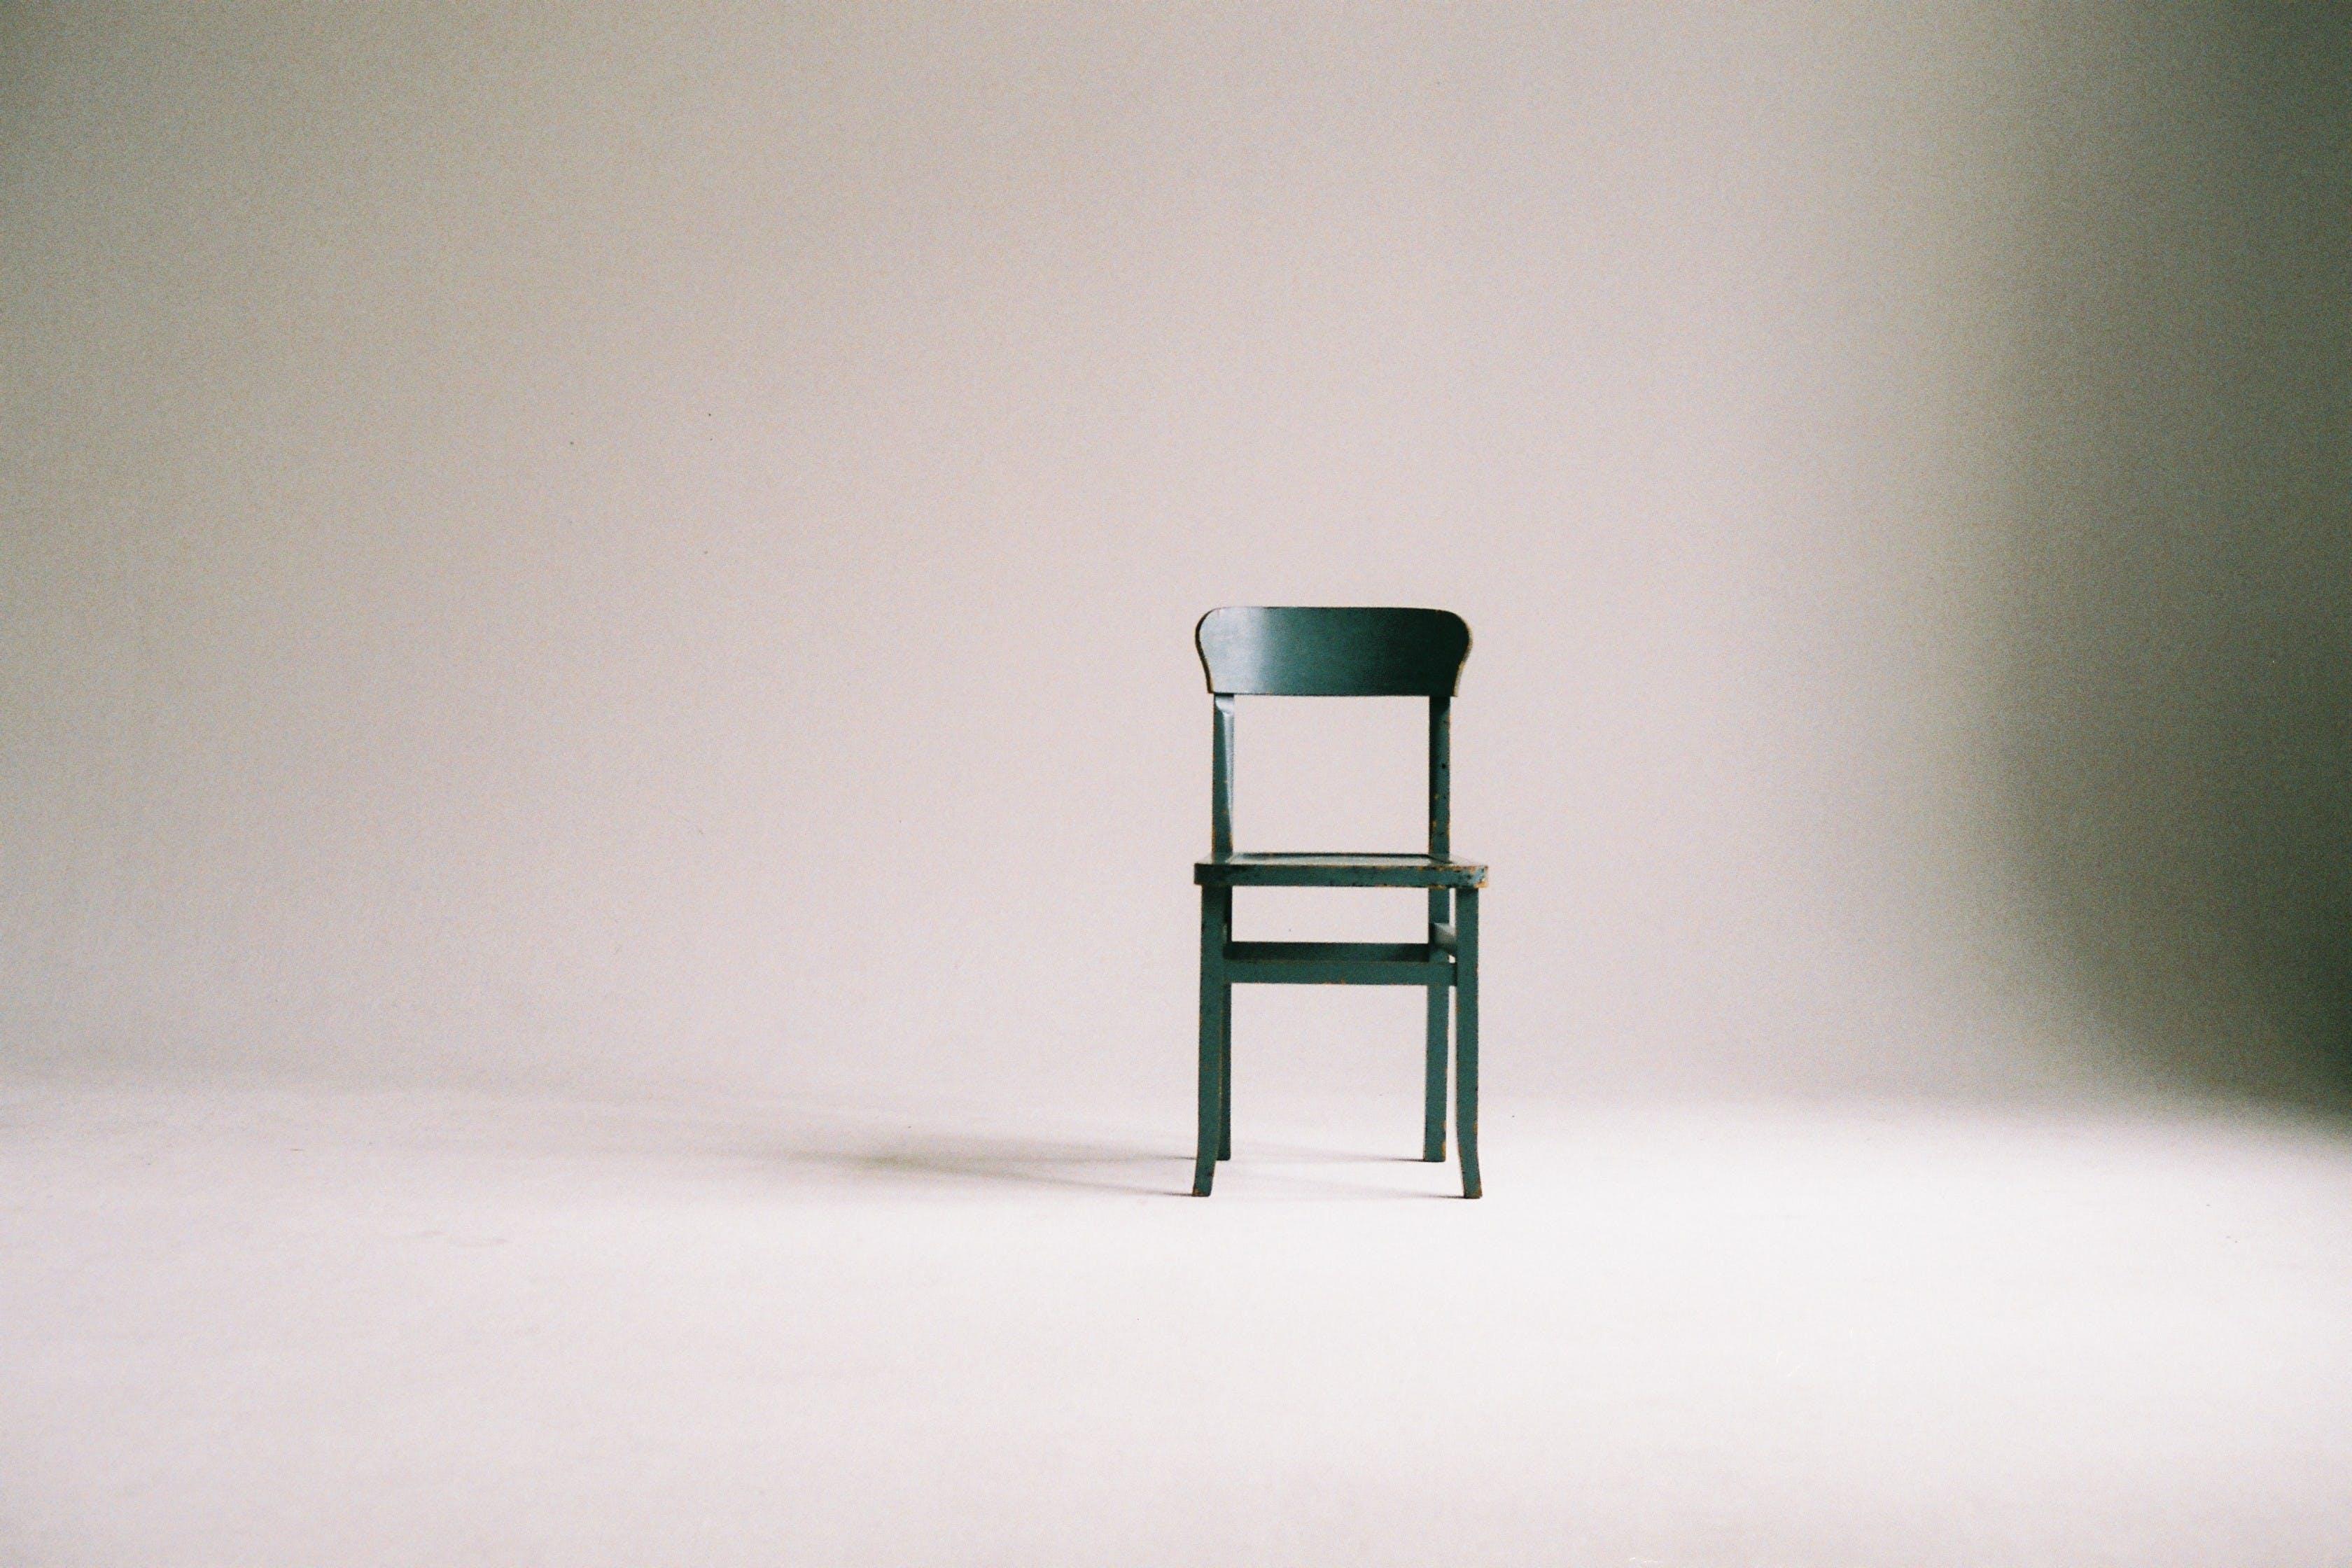 Fotos de stock gratuitas de adentro, analógico, Arte, asiento